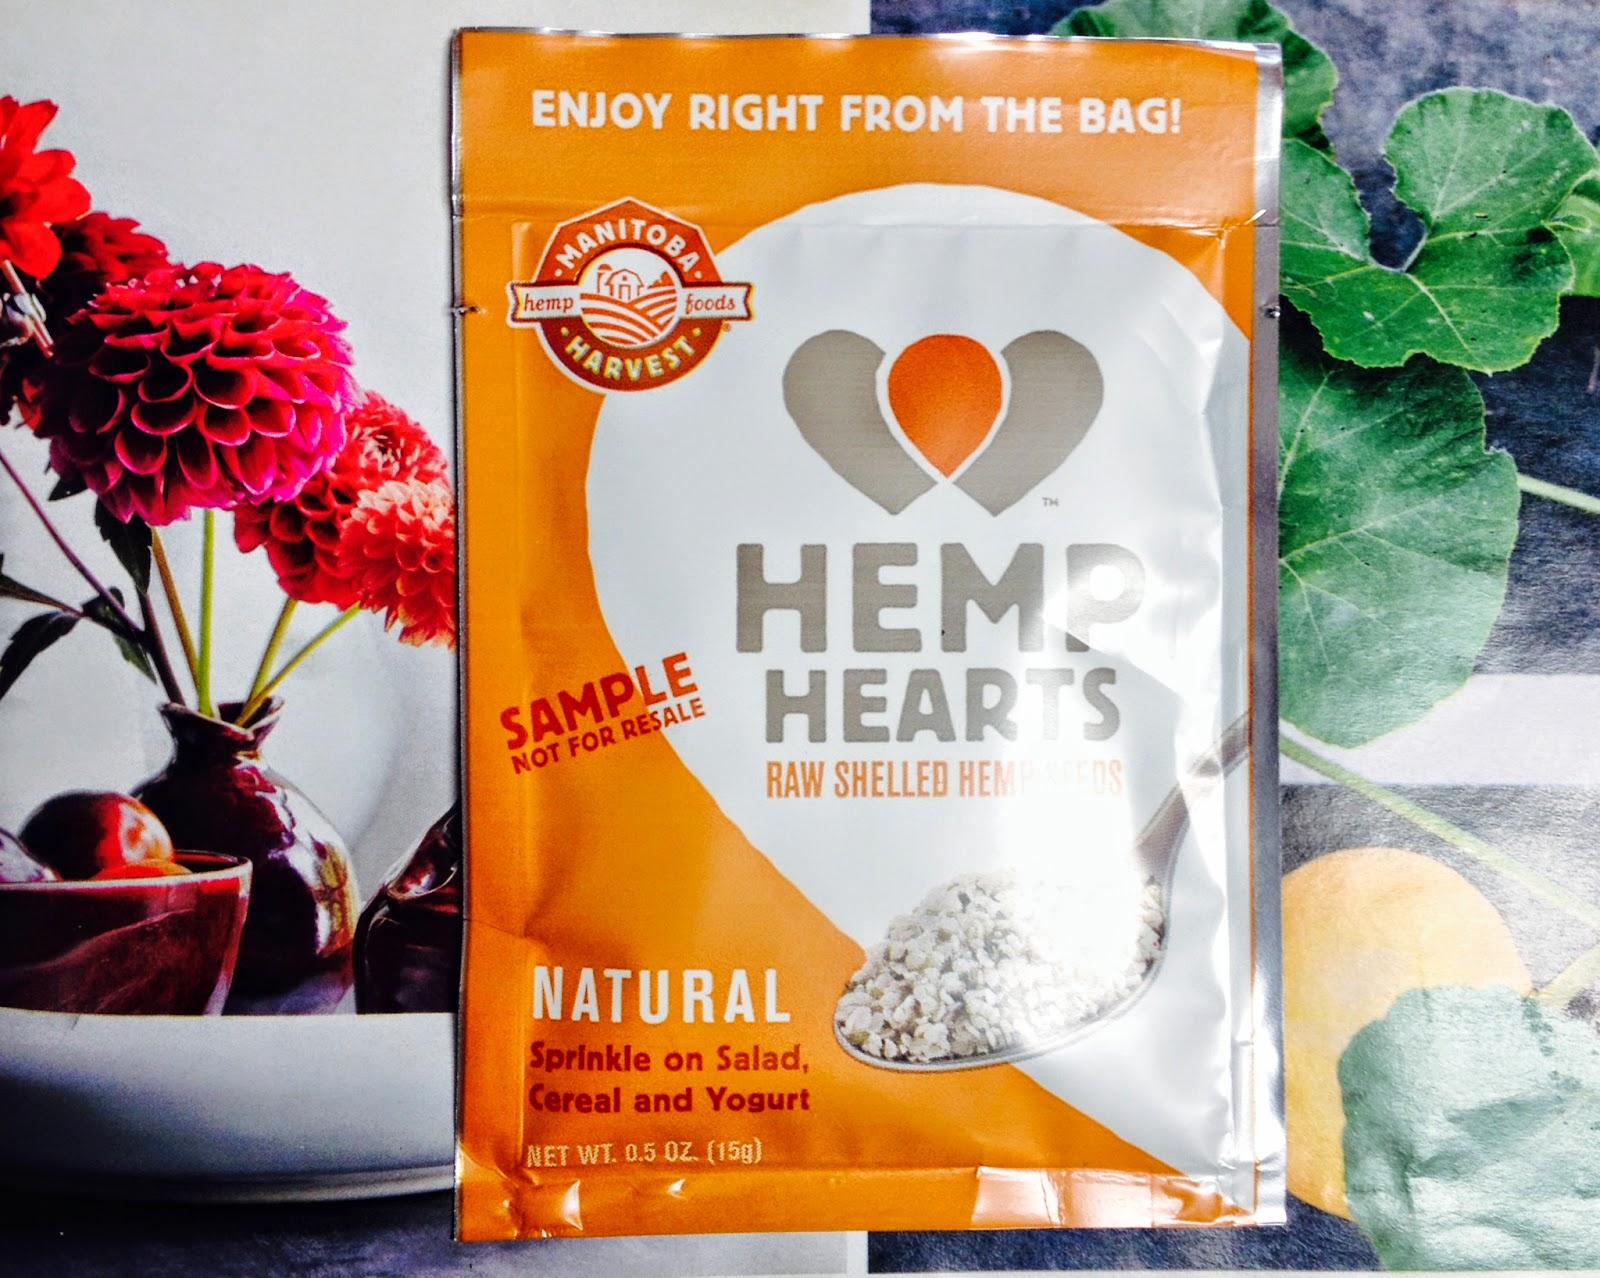 My Experience With Hemp Hearts Raw Shelled Hemp Seeds